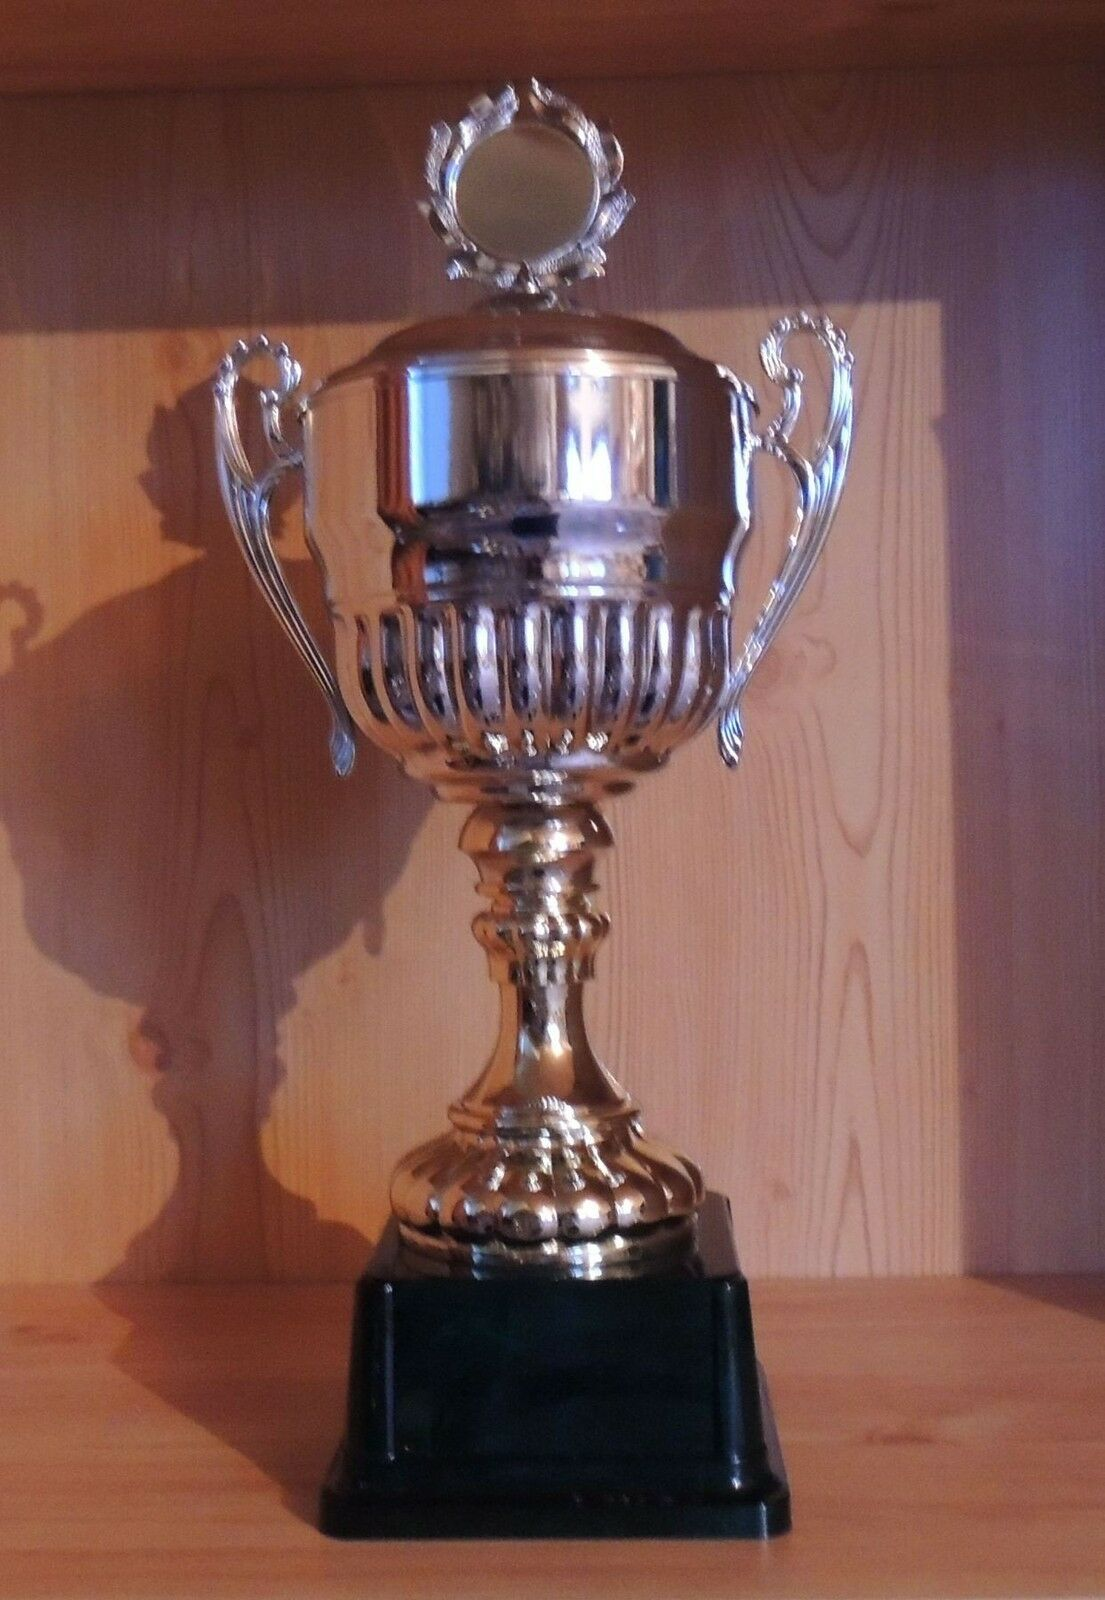 1 Henkelpokal Wanderpokal silber mit Emblem 48cm  EZ8(Pokal Pokale Gravur Sport)